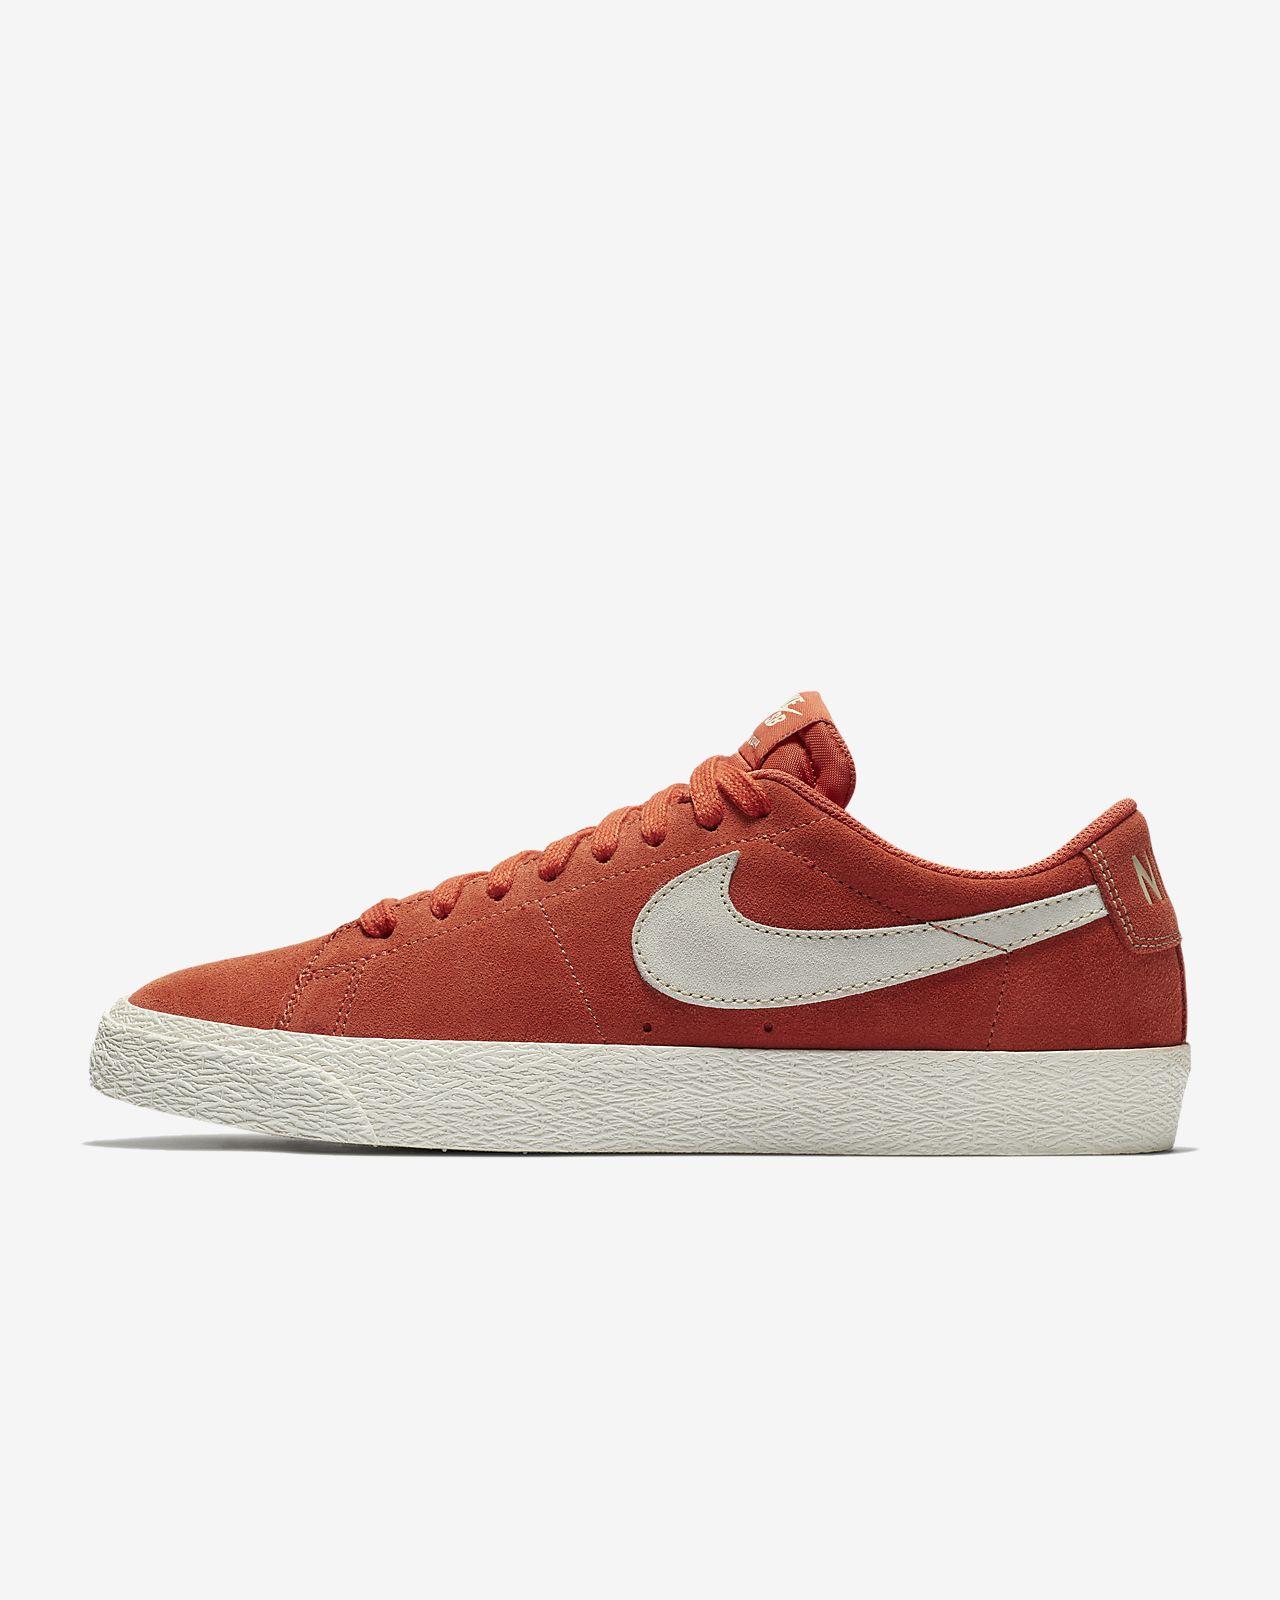 Chaussure Blazer De Skateboard Nike Sb Blazer Chaussure Zoom Low Pour Lu edecb9